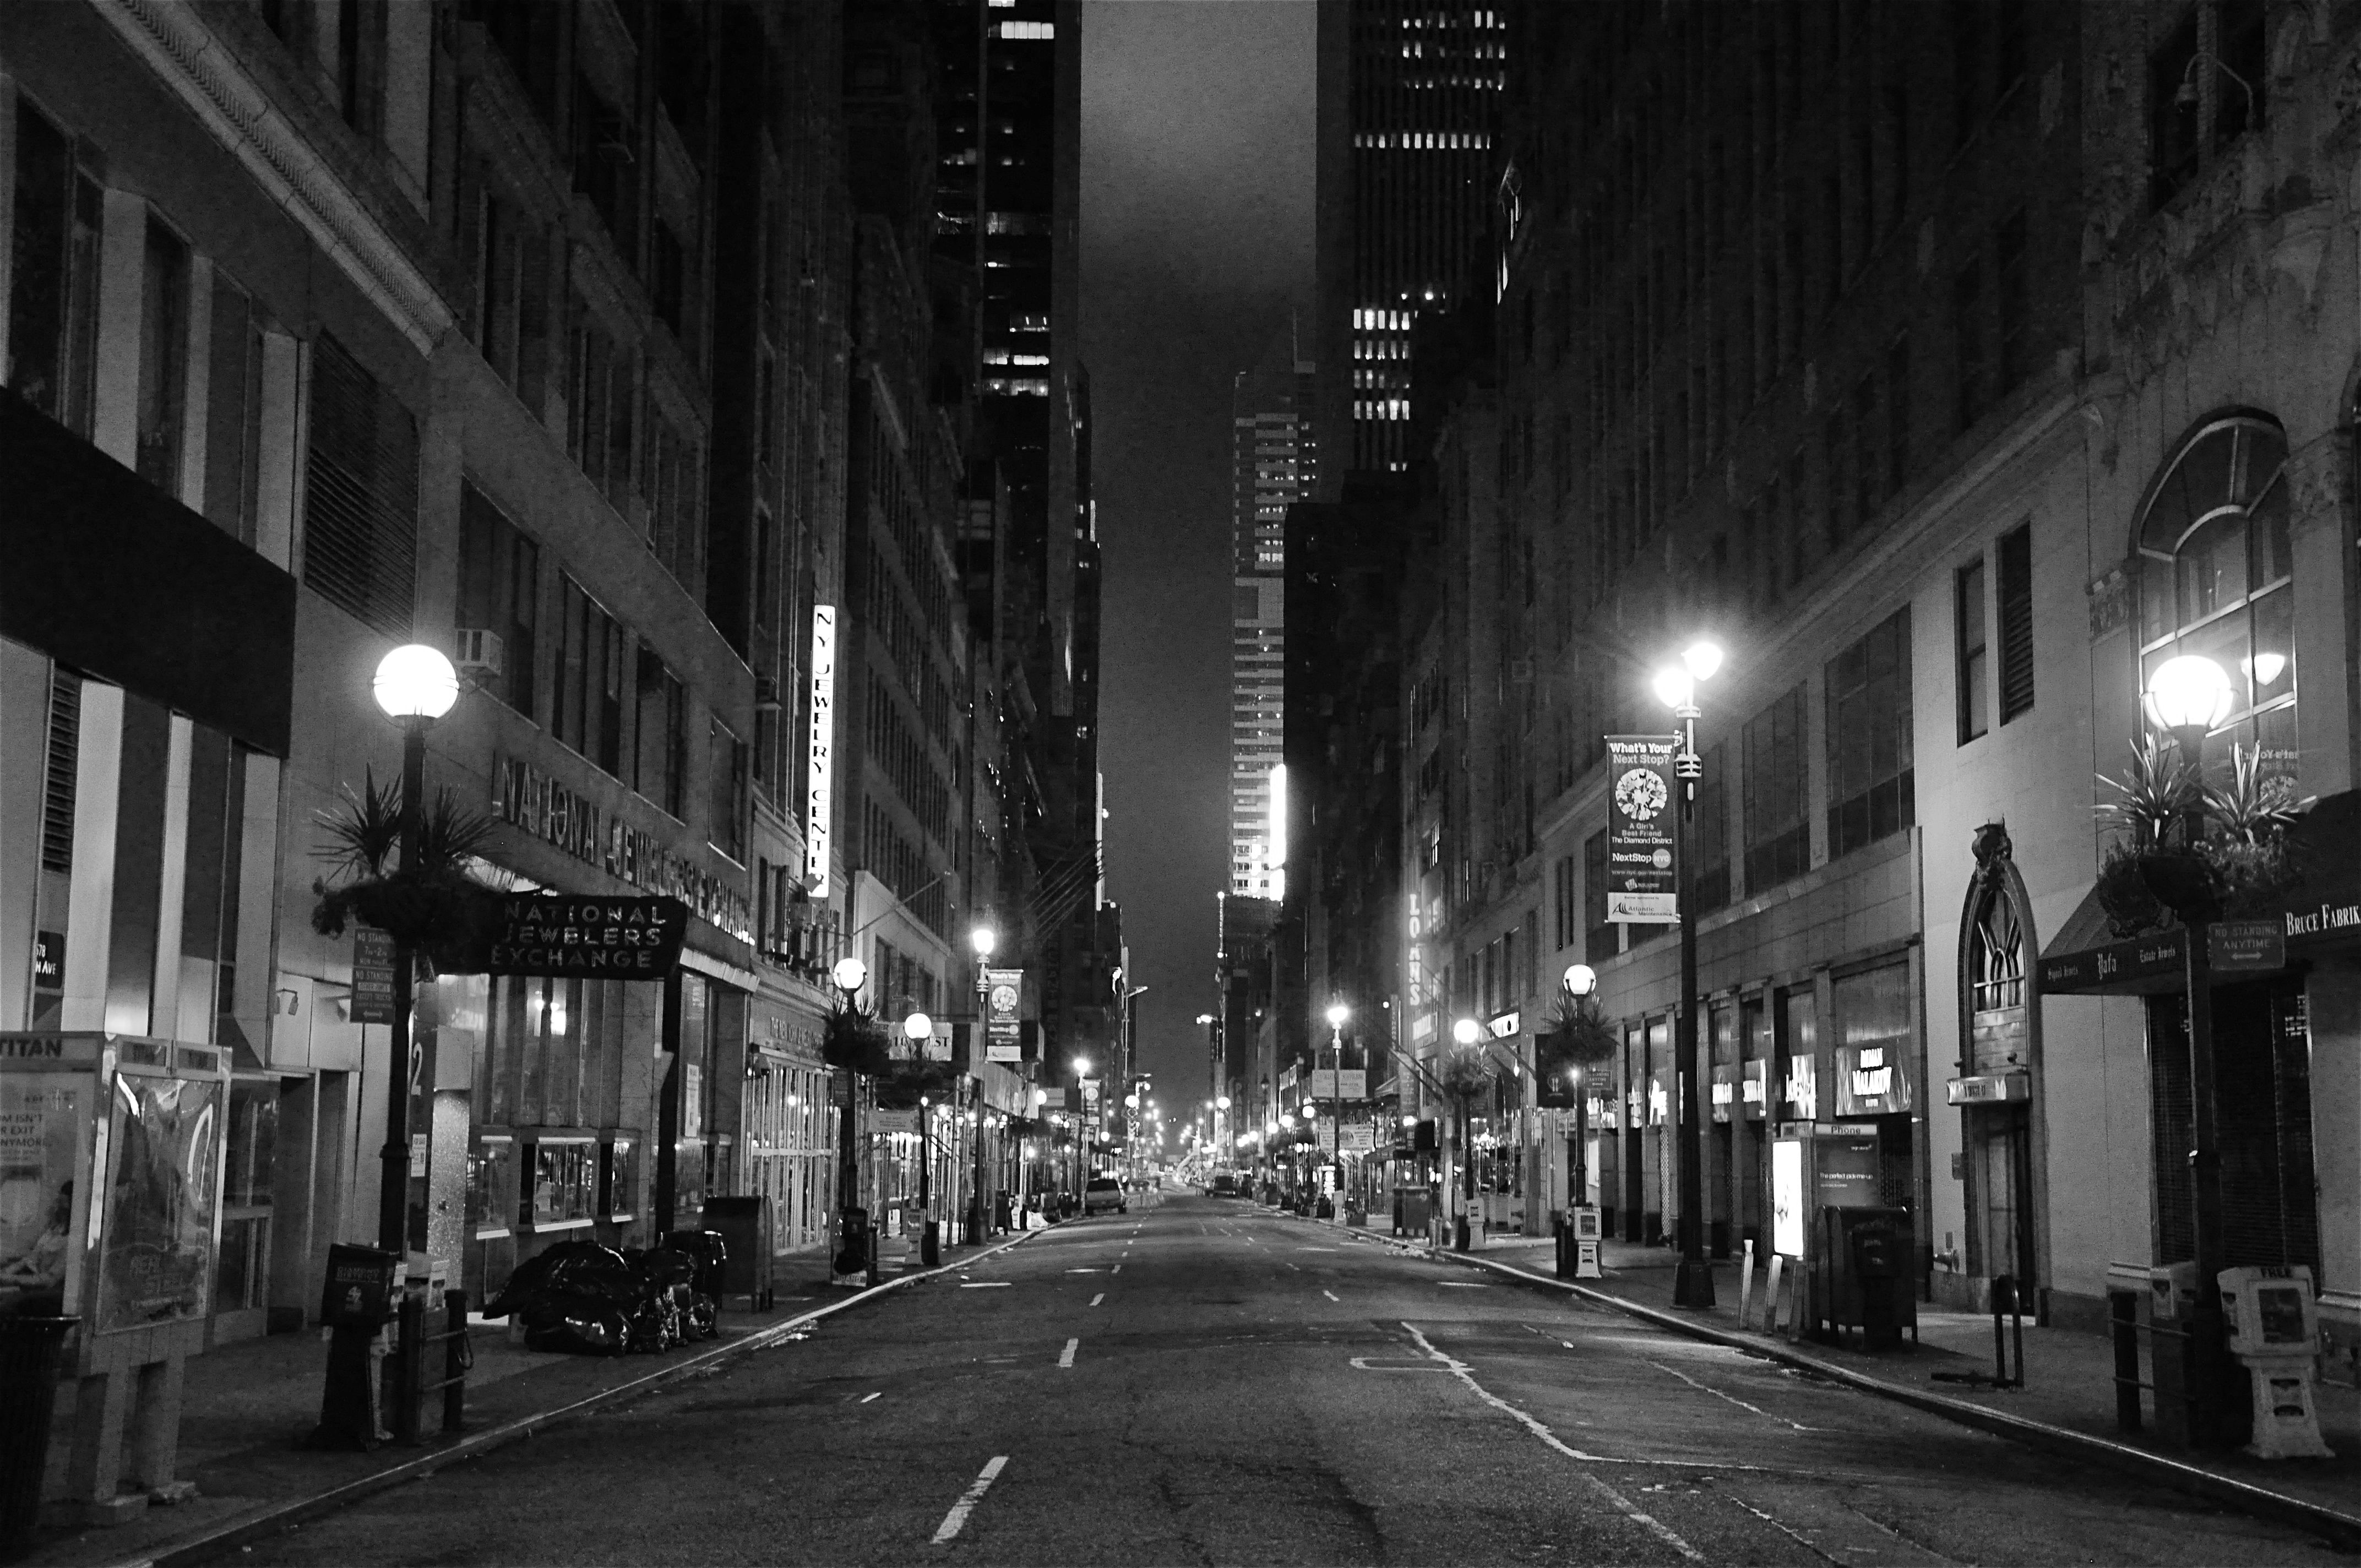 City Street City Streets Photography City Streets Street Photography